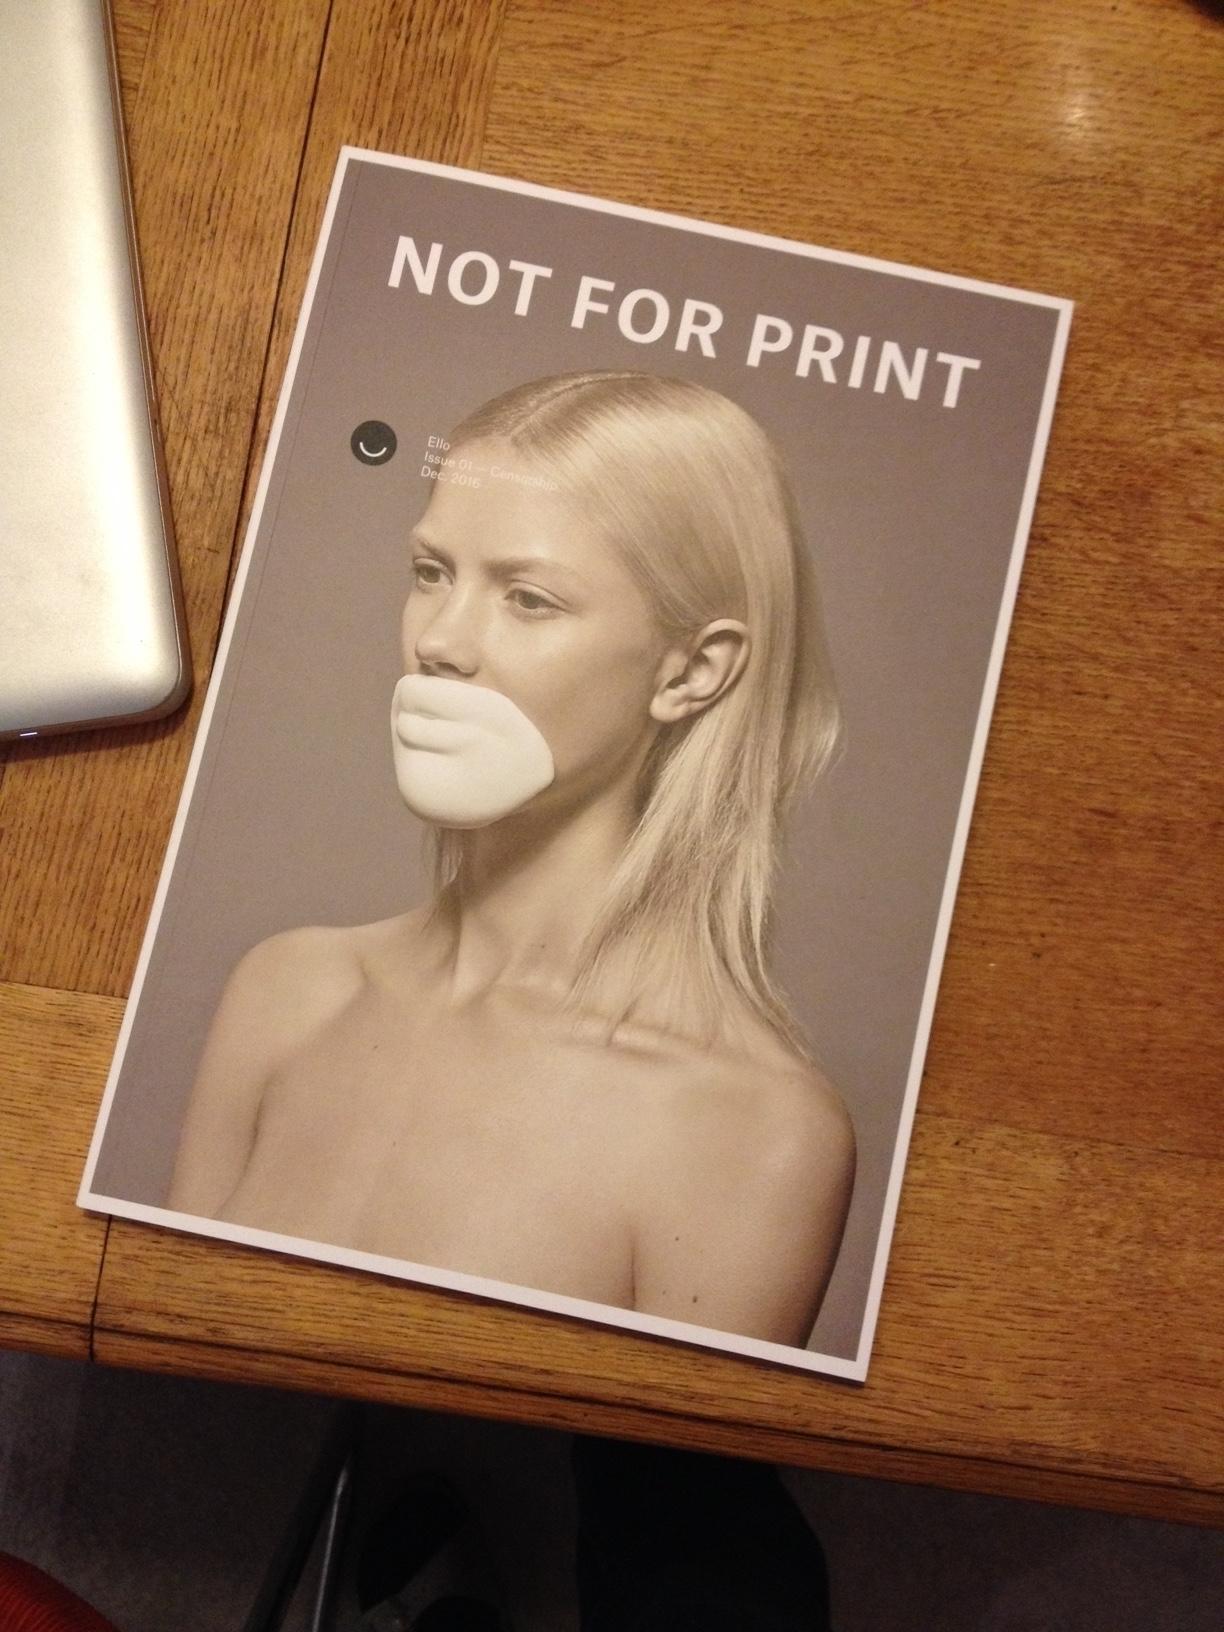 Today received copy PRINT. Wauw - gudakoster | ello